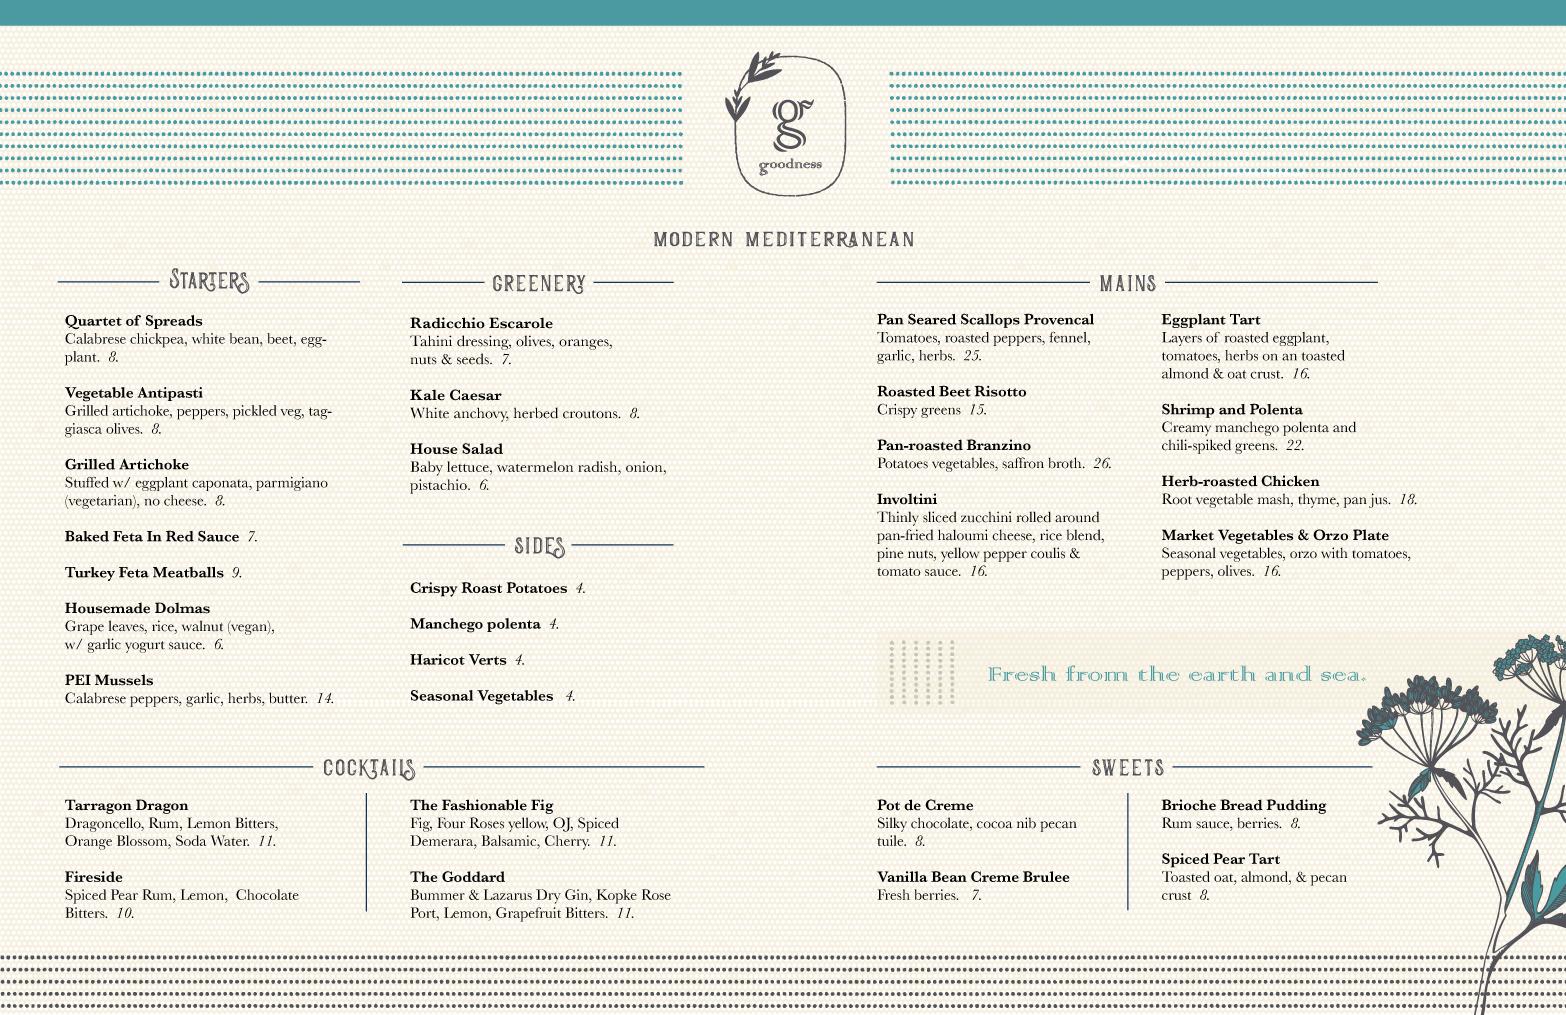 goodness_menu.jpg